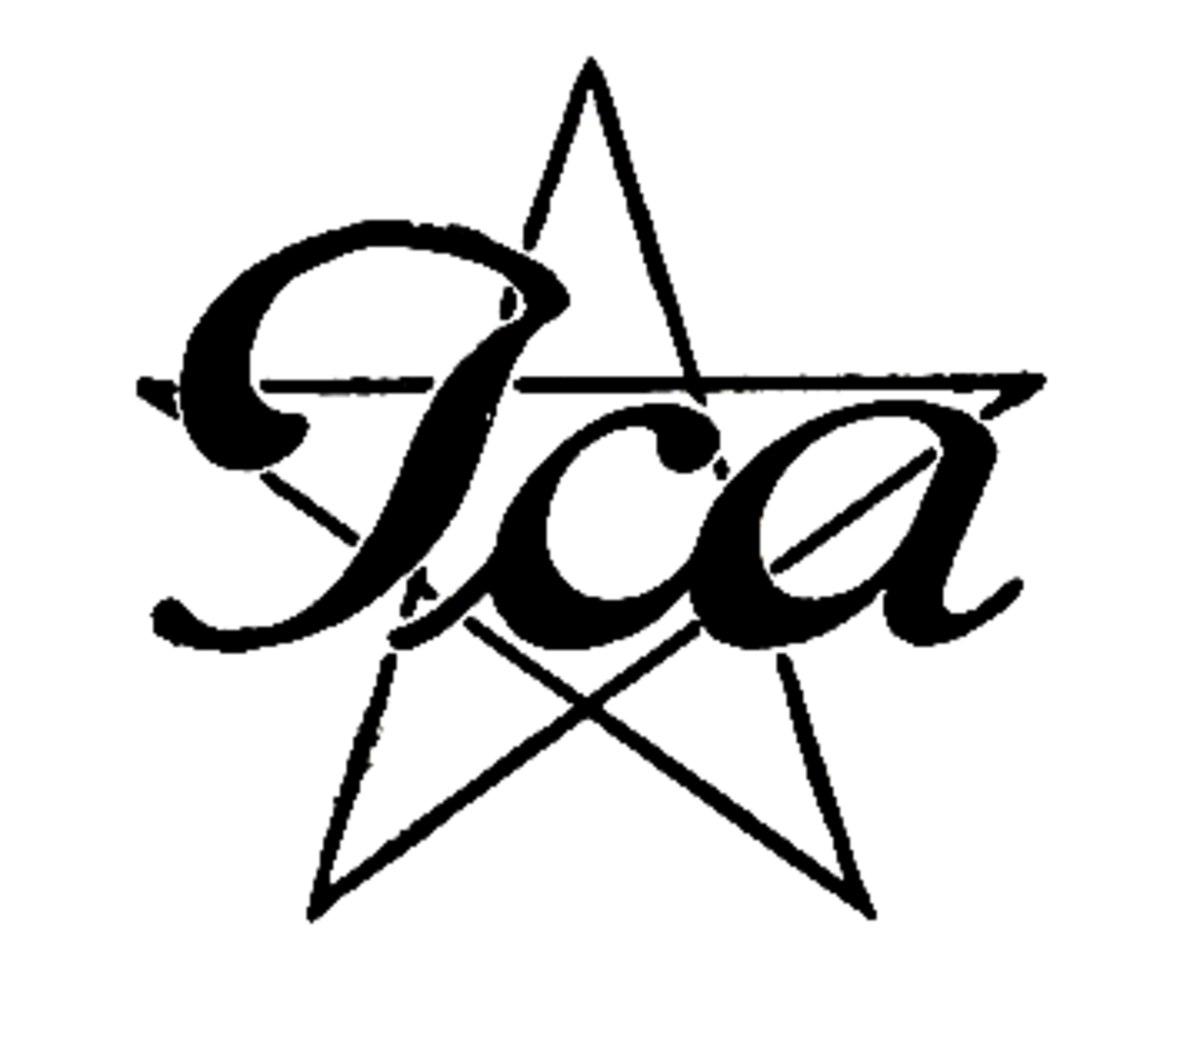 Internationale Camera Actiengesellschaft